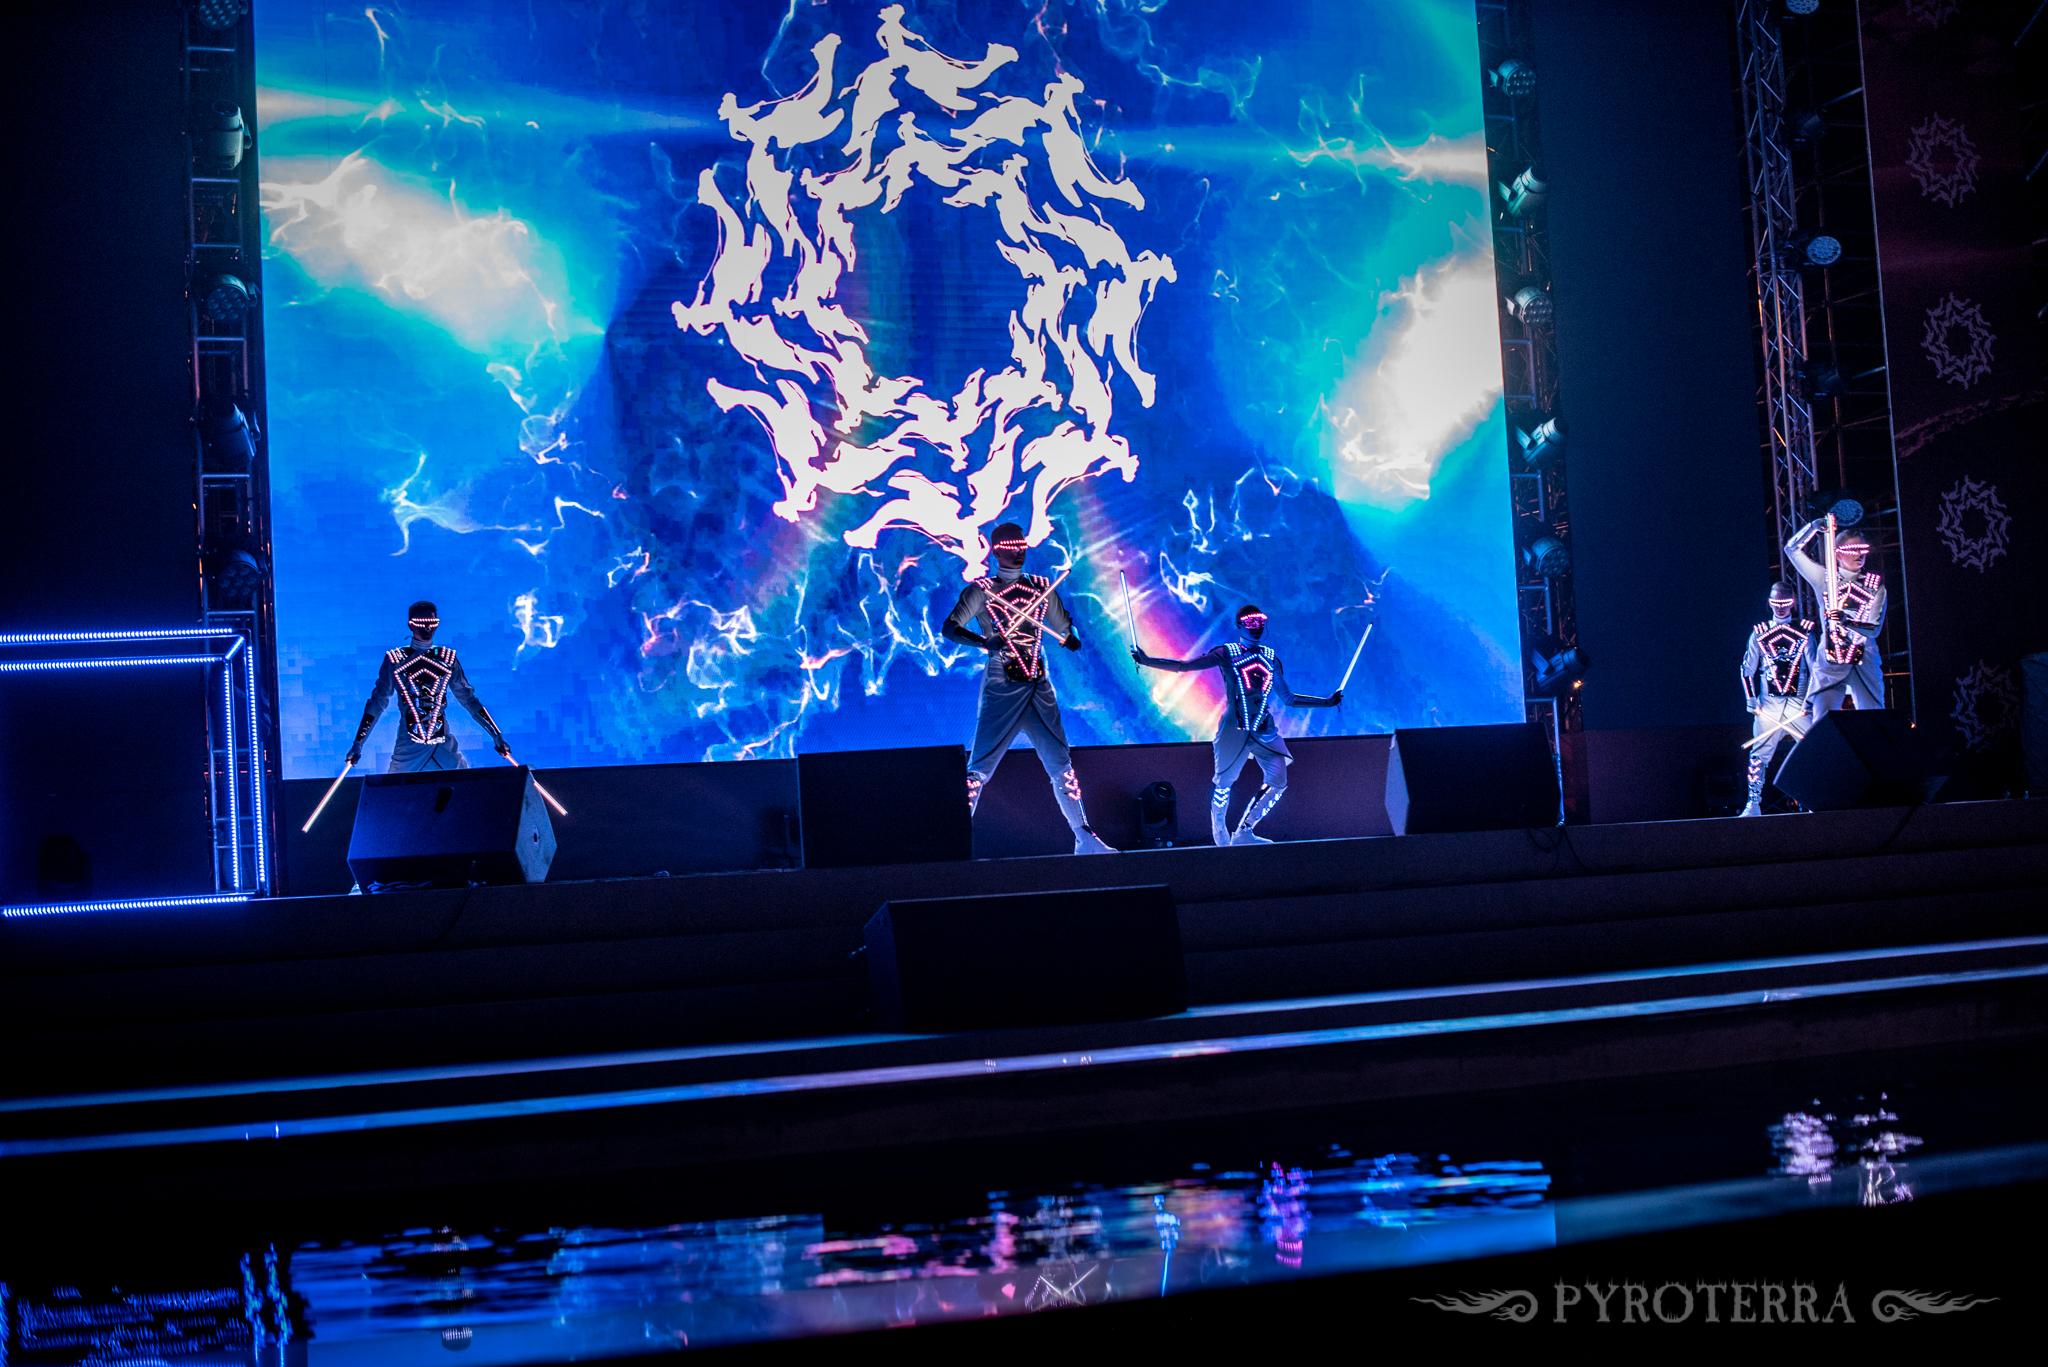 Pyroterra_ARABIA-MIRROR_LED_costume_show